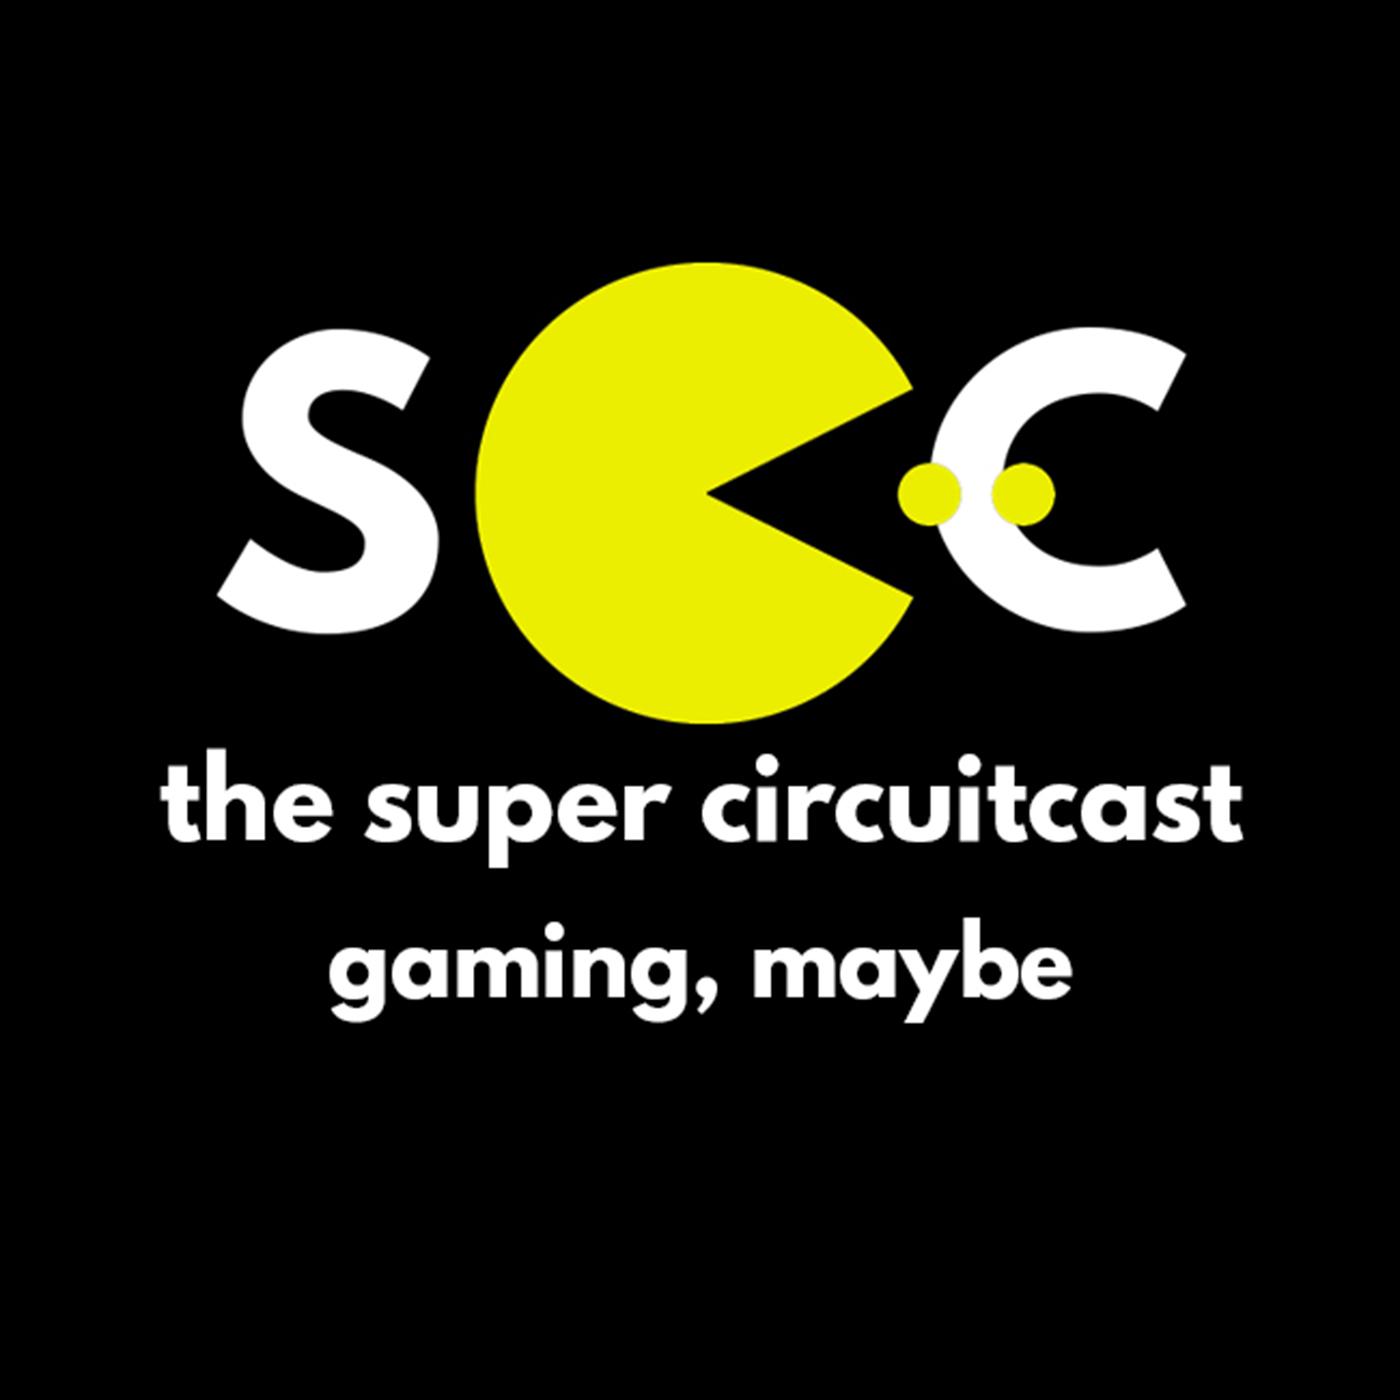 The Super Circuitcast!